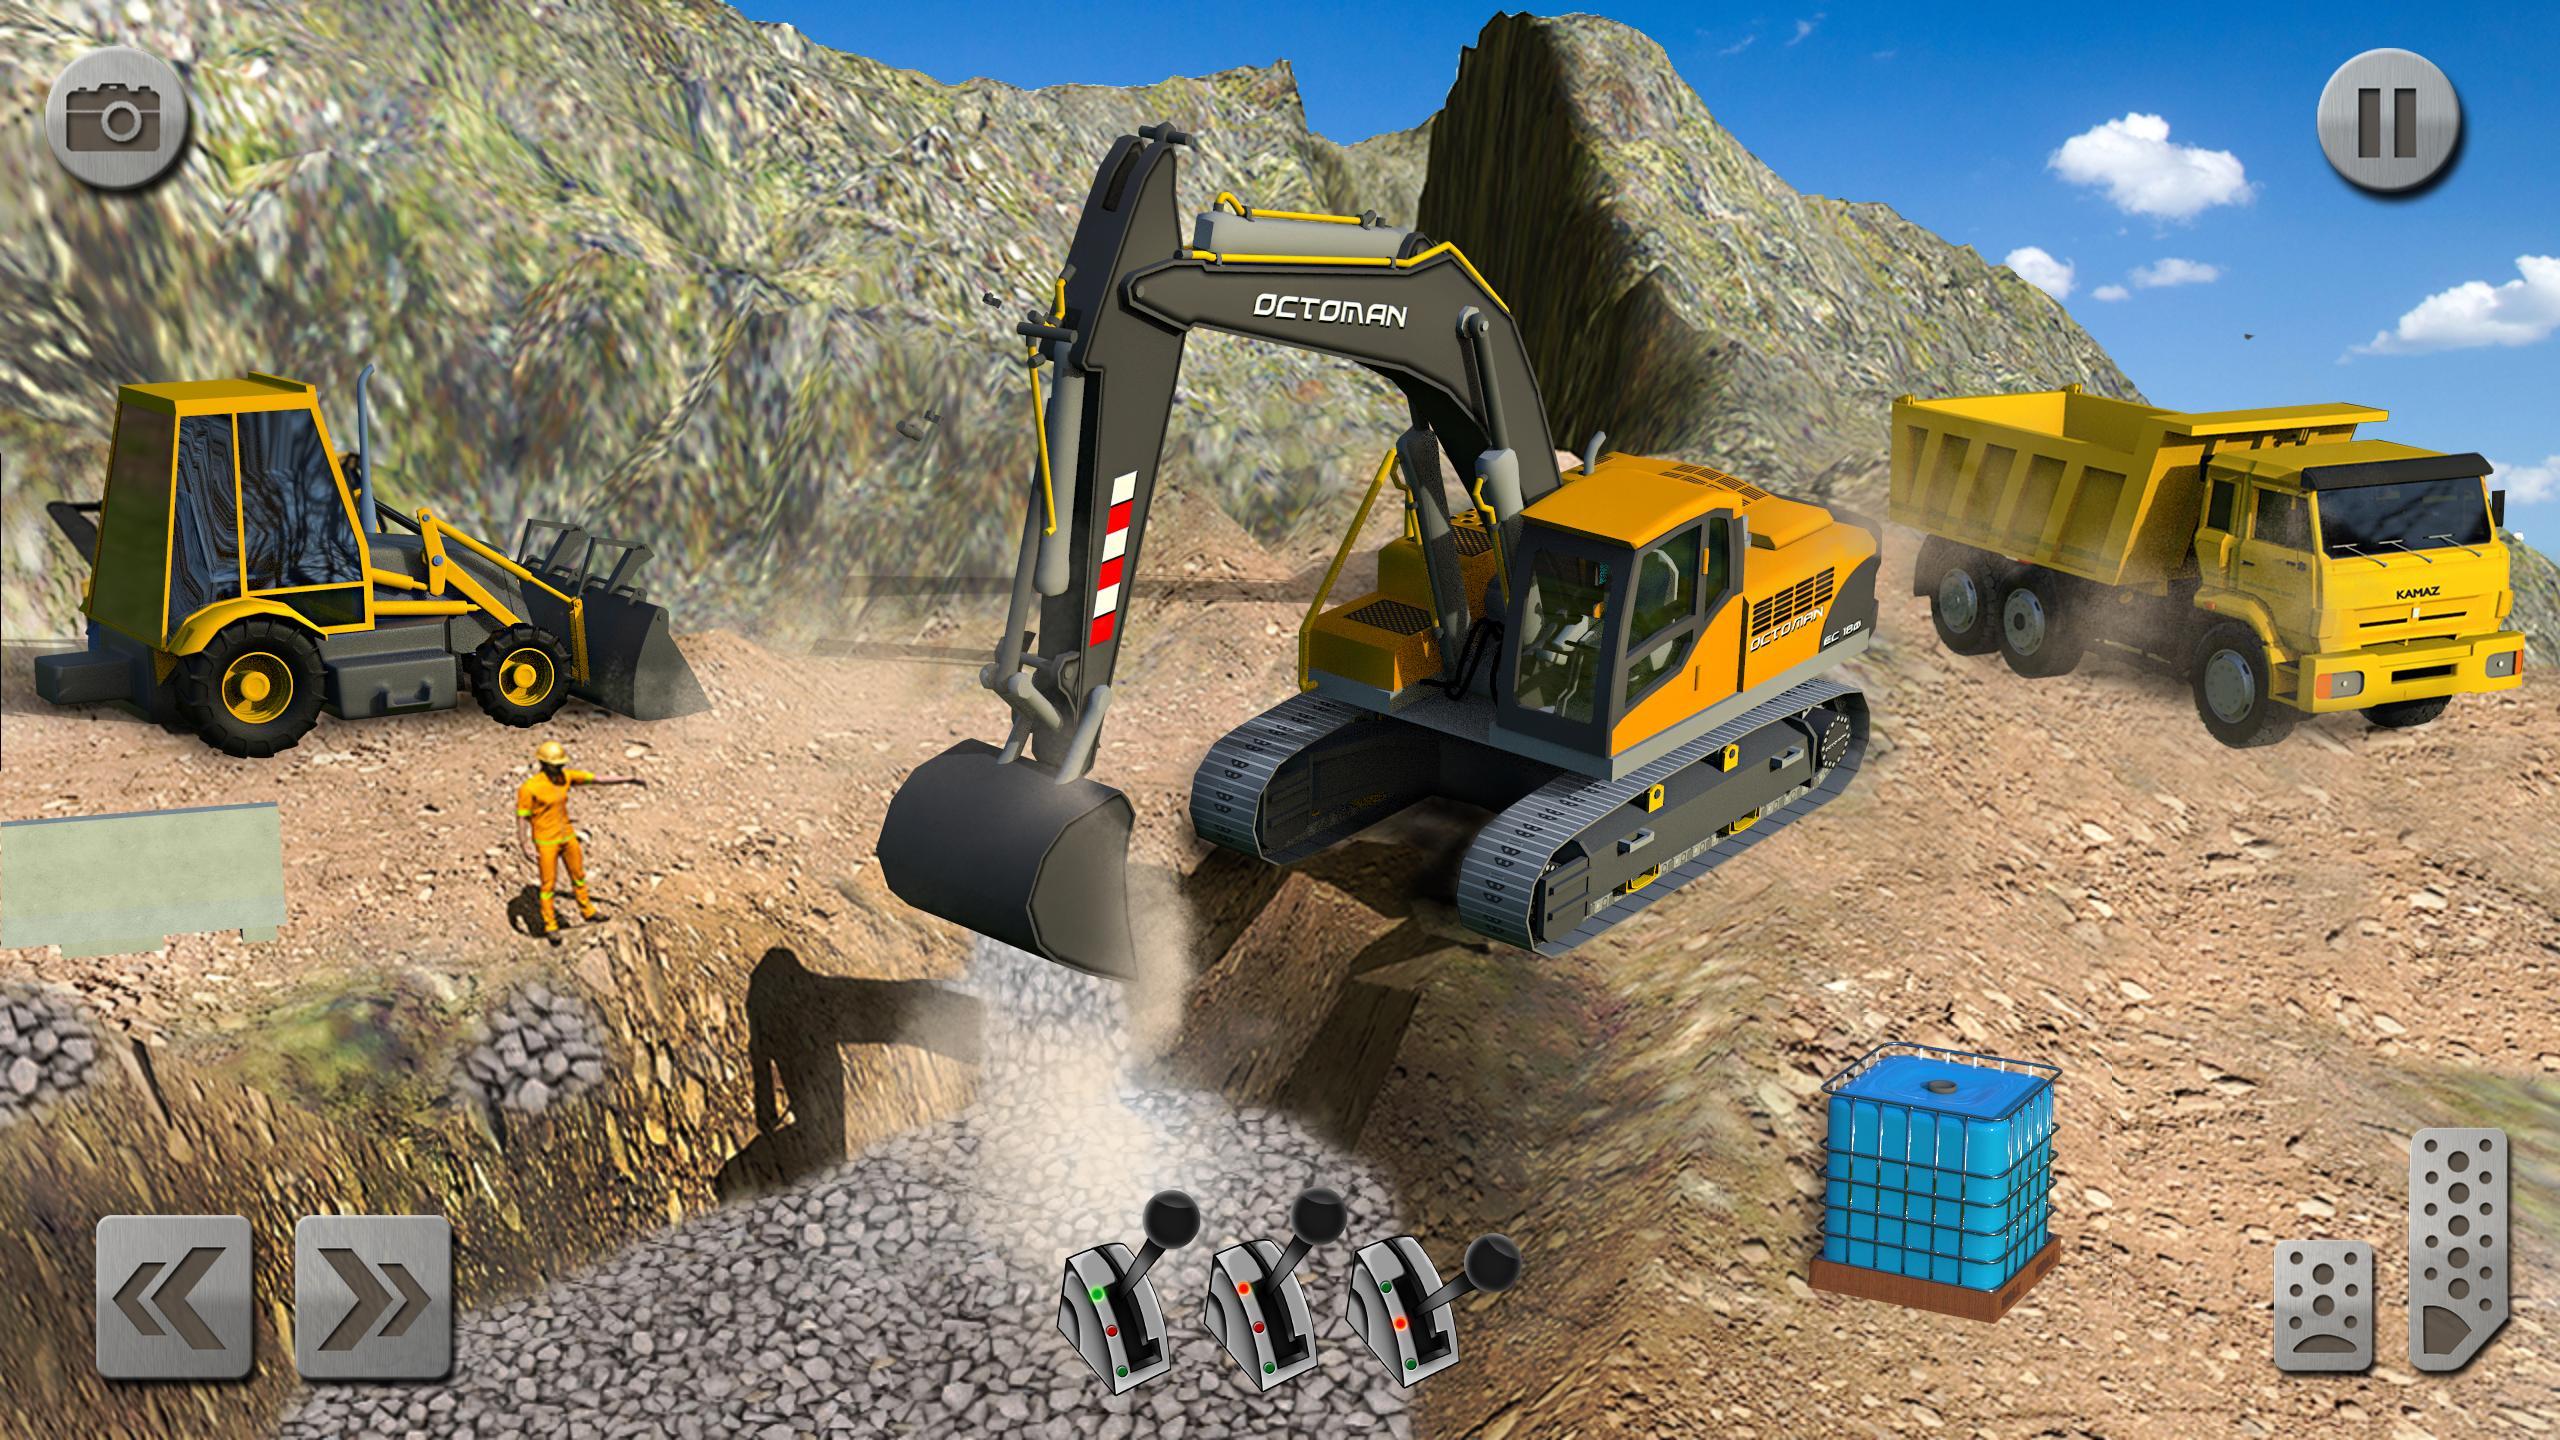 Sand Excavator Truck Driving Rescue Simulator game 5.2 Screenshot 19